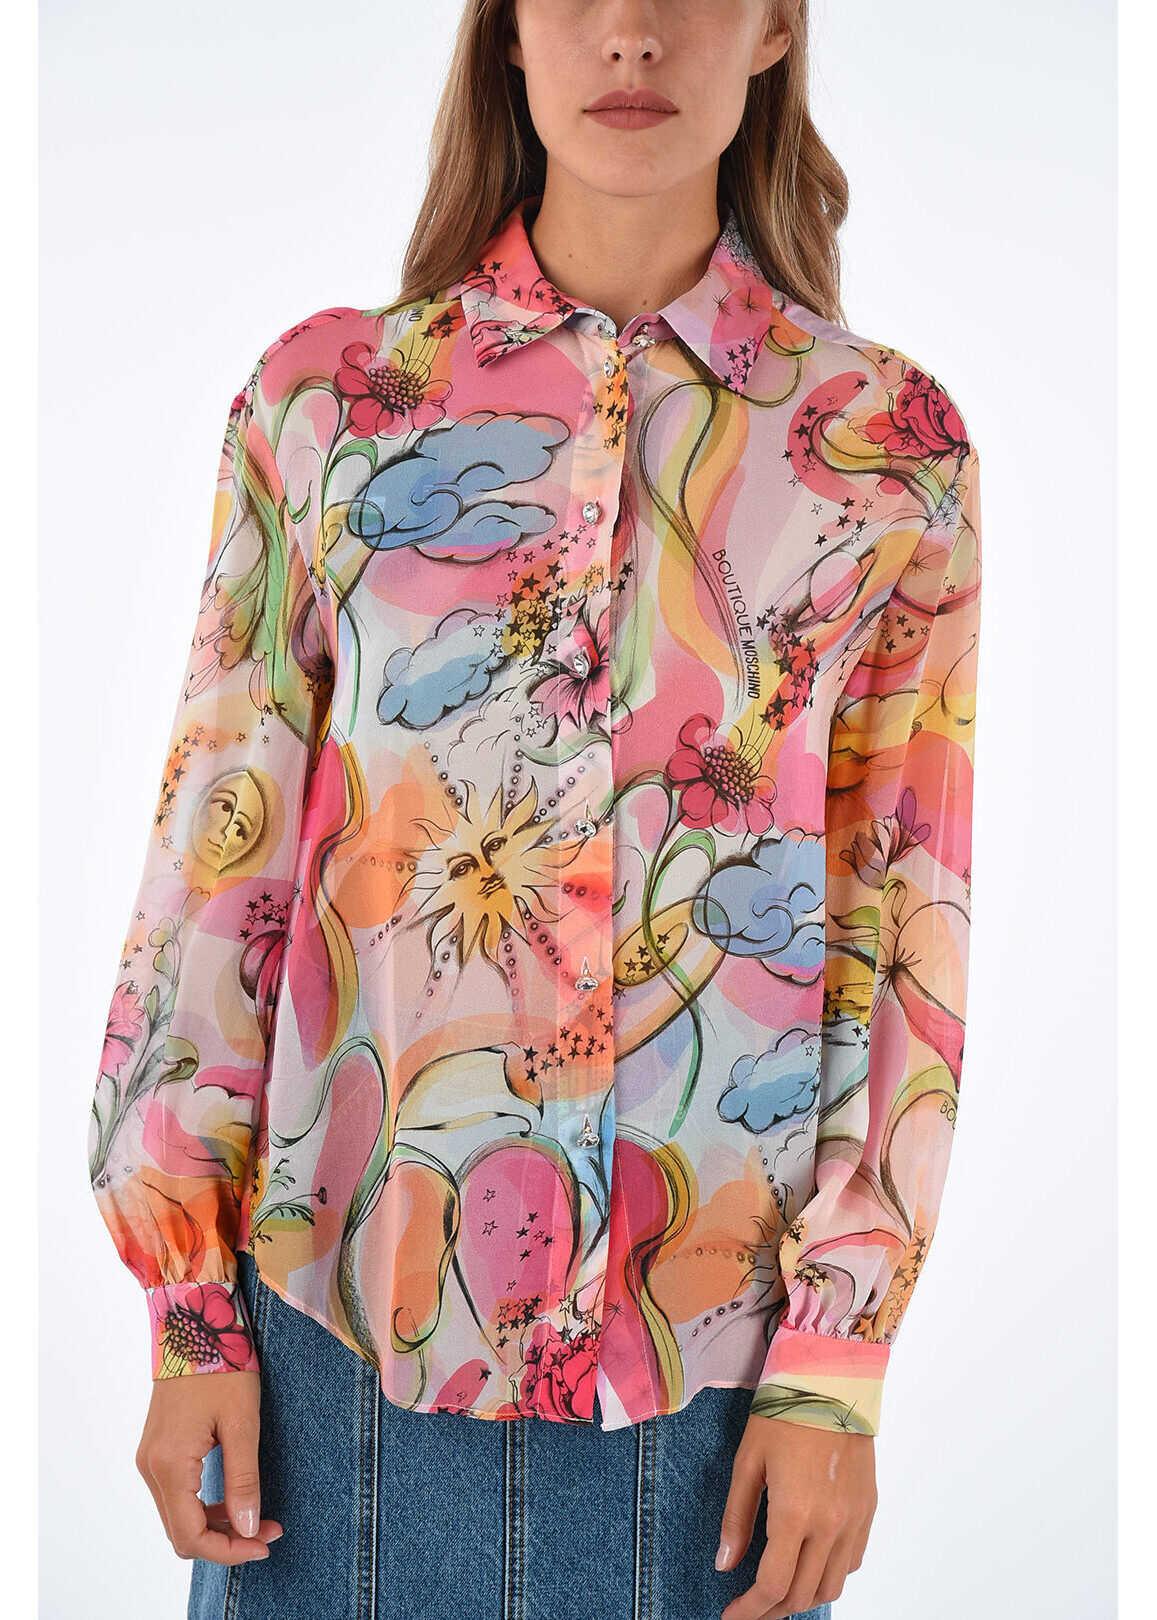 Moschino BOUTIQUE silk blouse MULTICOLOR